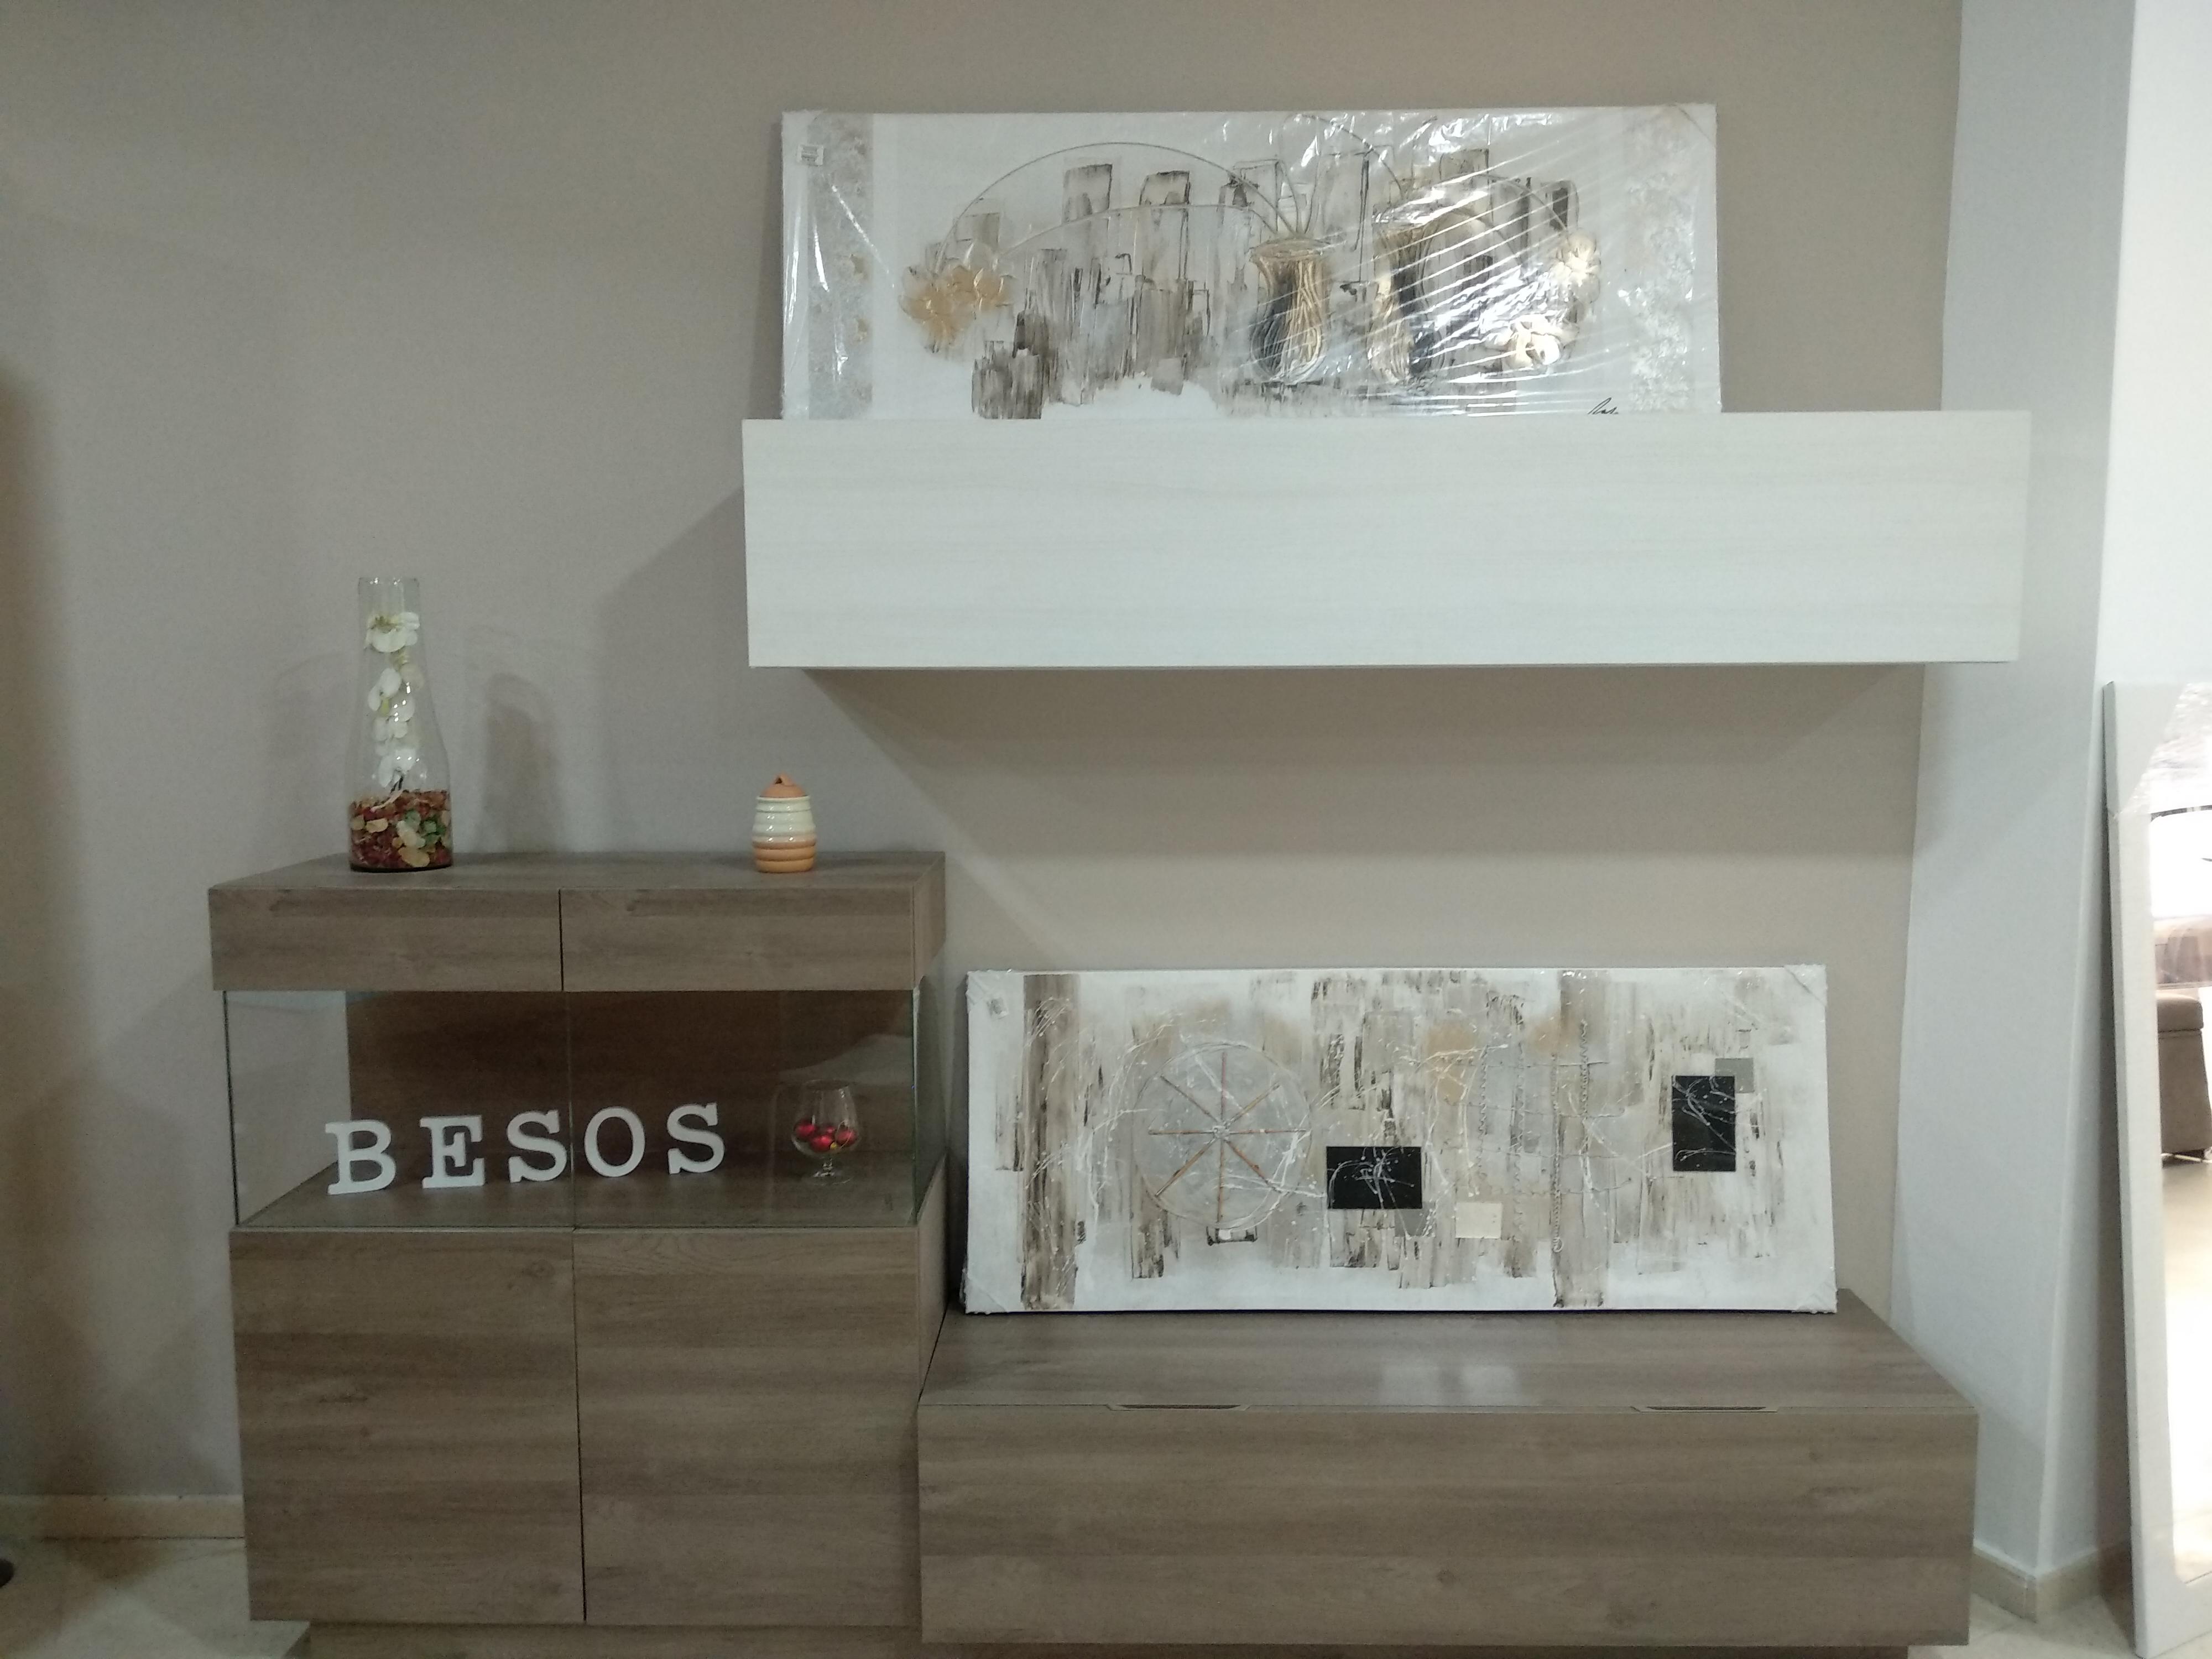 Blog de muebles muebles belda - Muebles belda ...